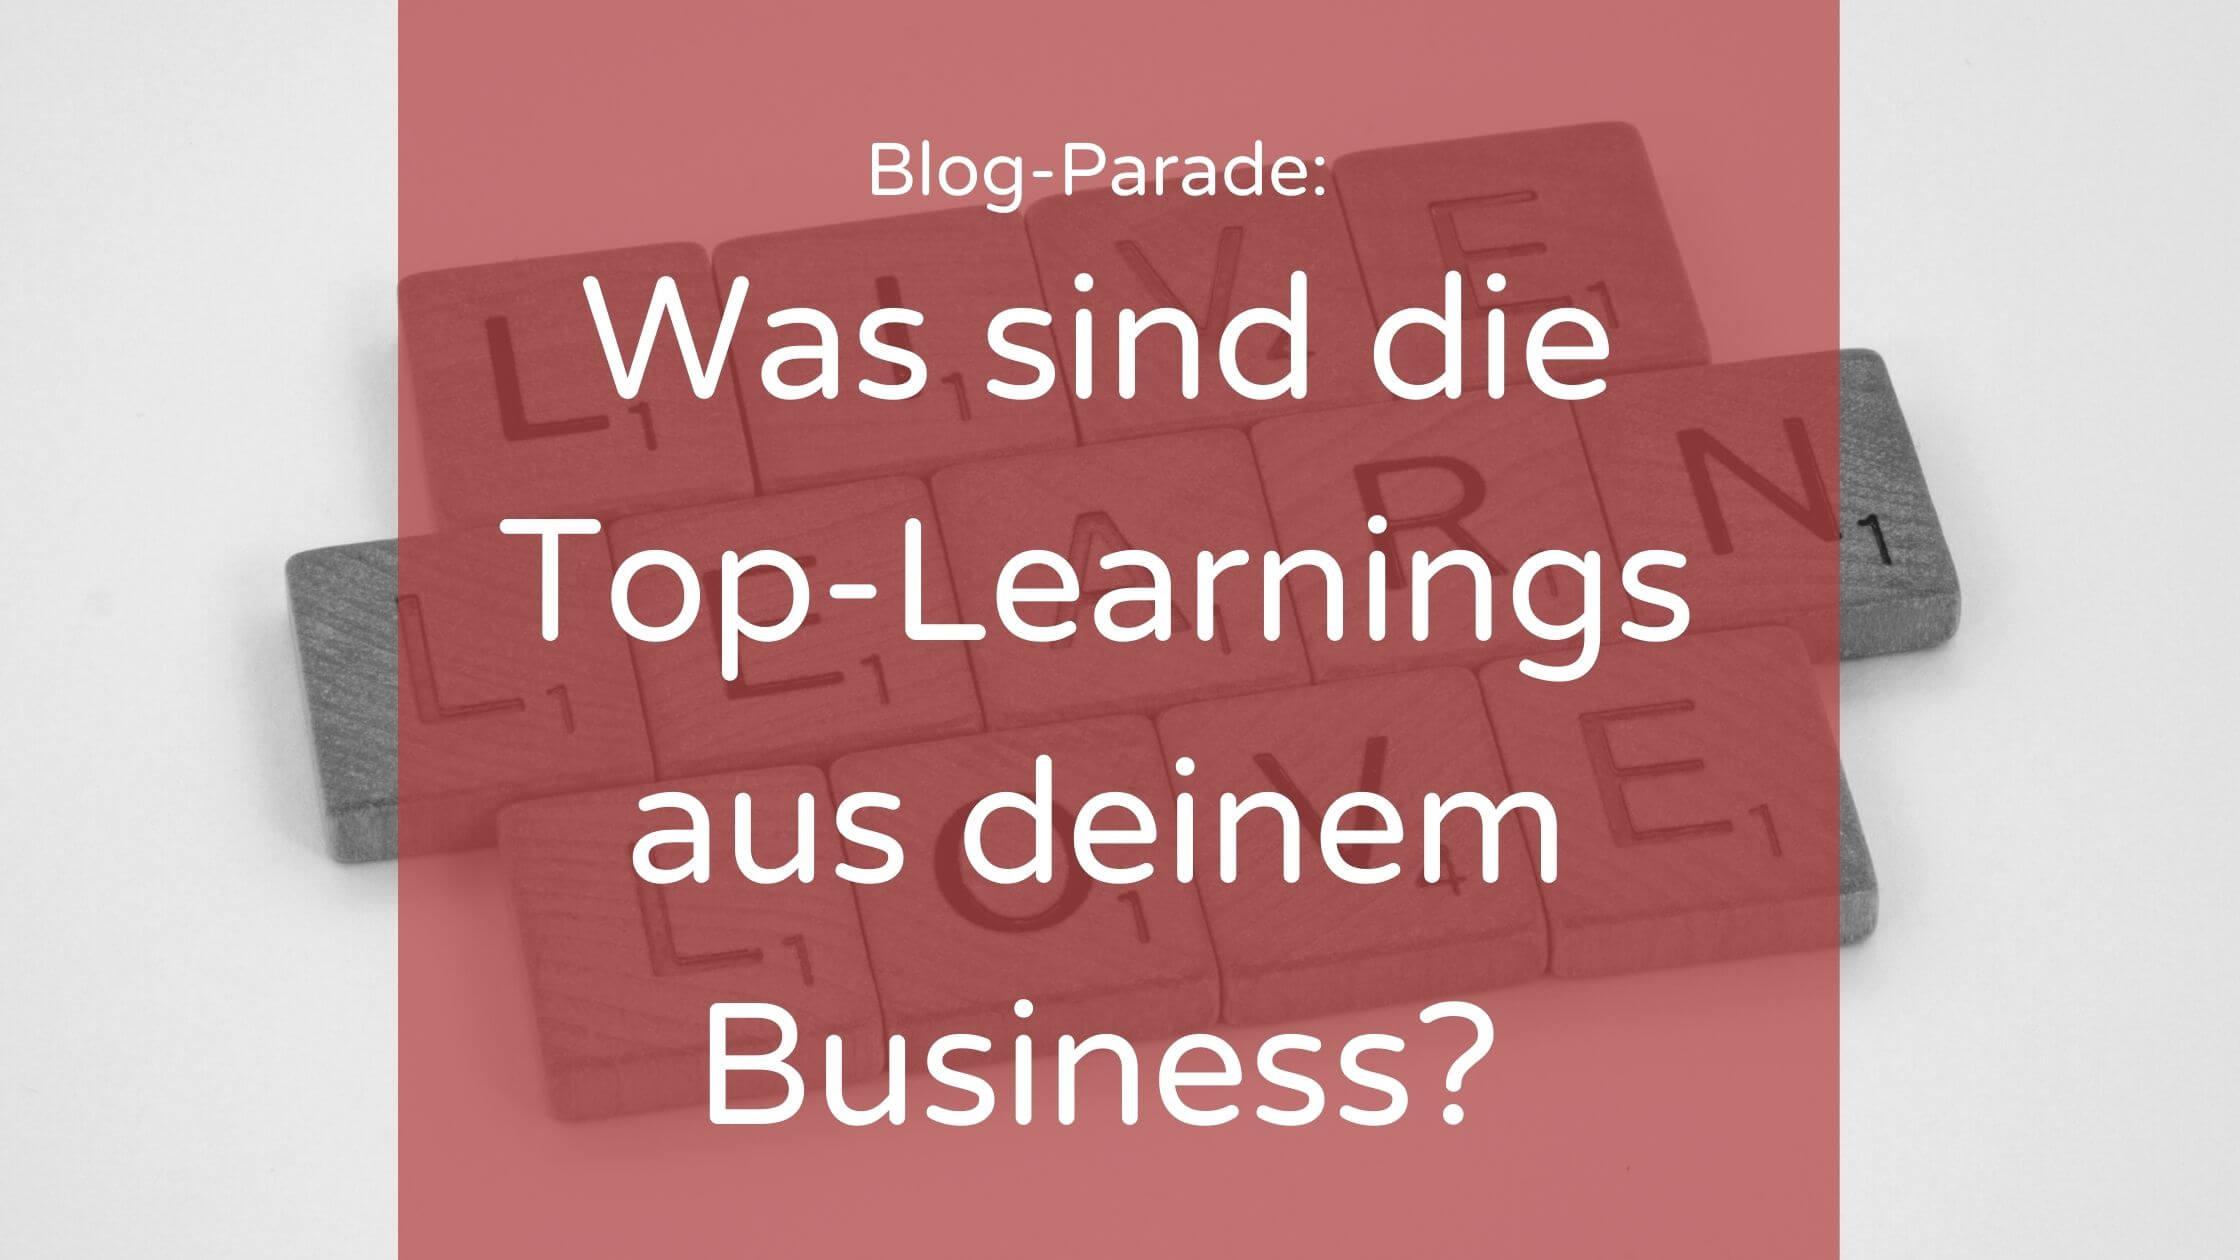 Was sind die Top-Learnings aus deinem Business?